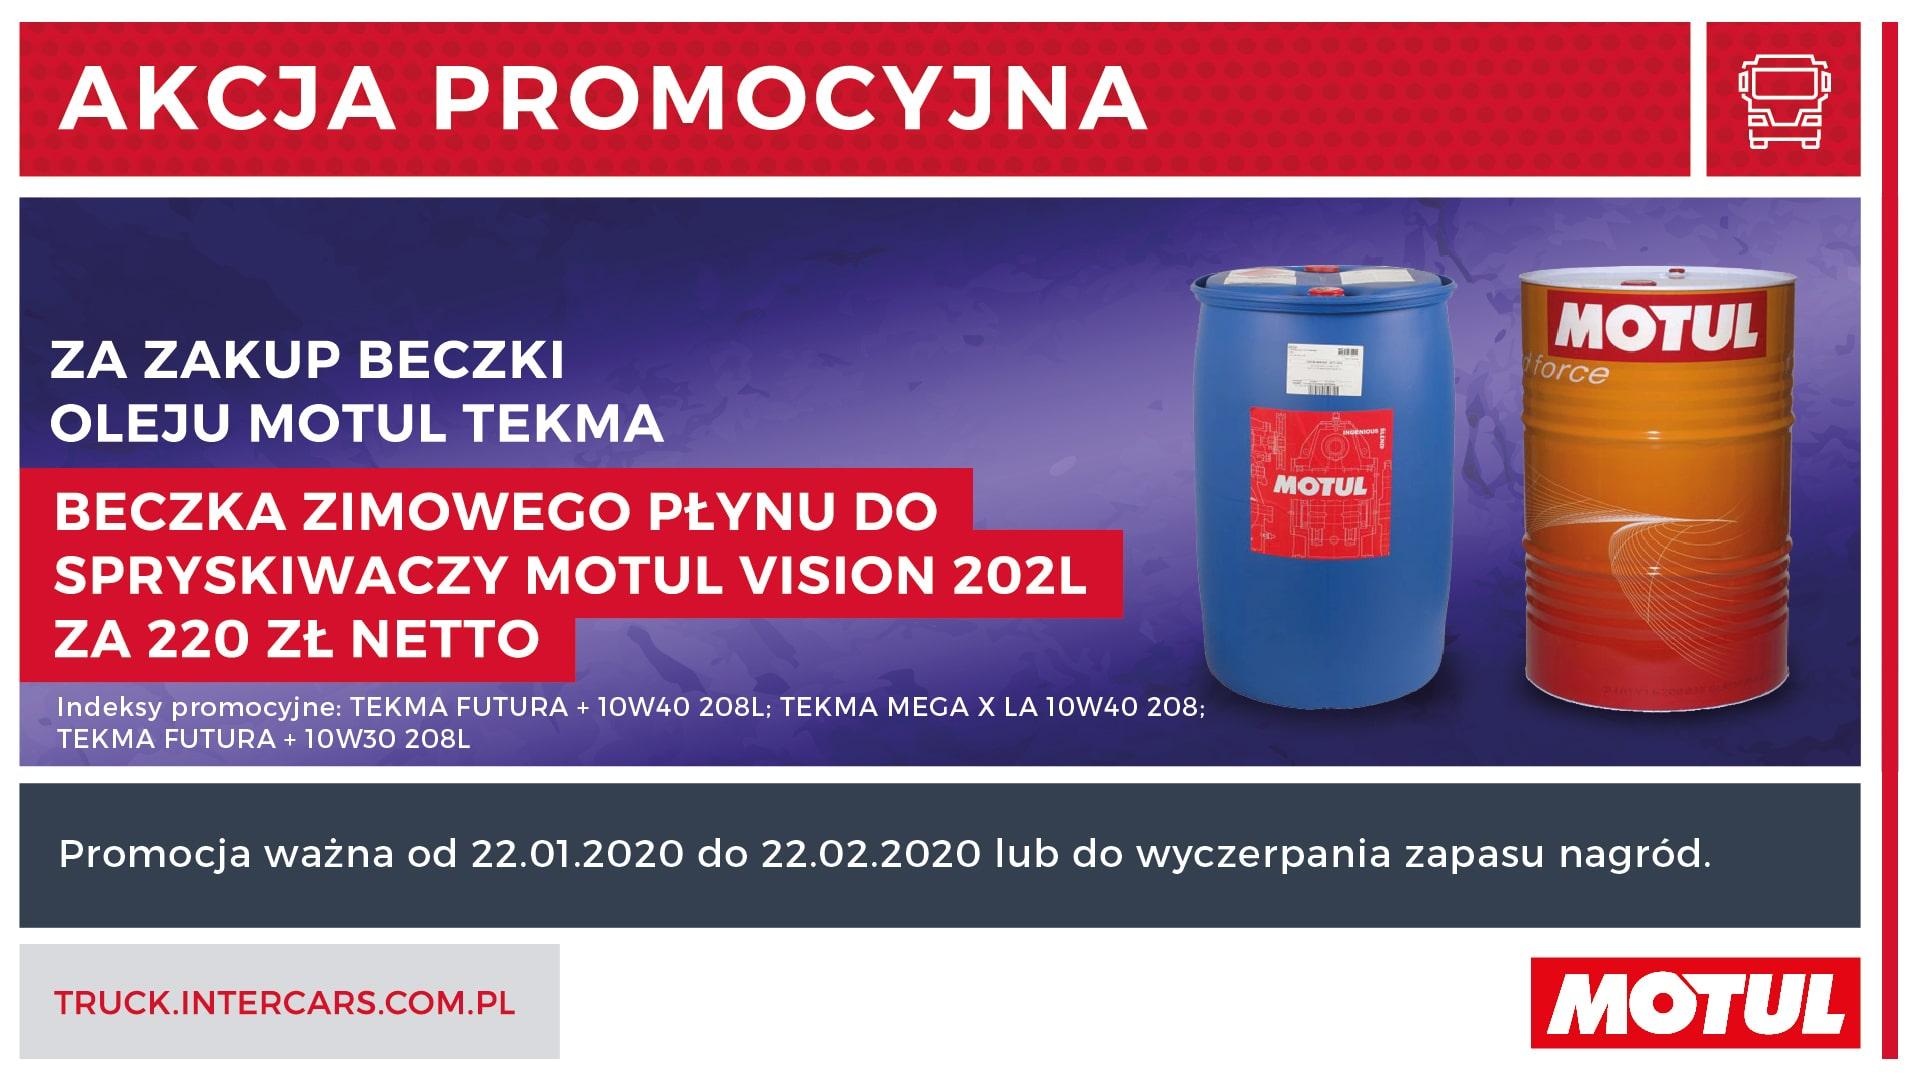 Motul_promocja-truck.jpg